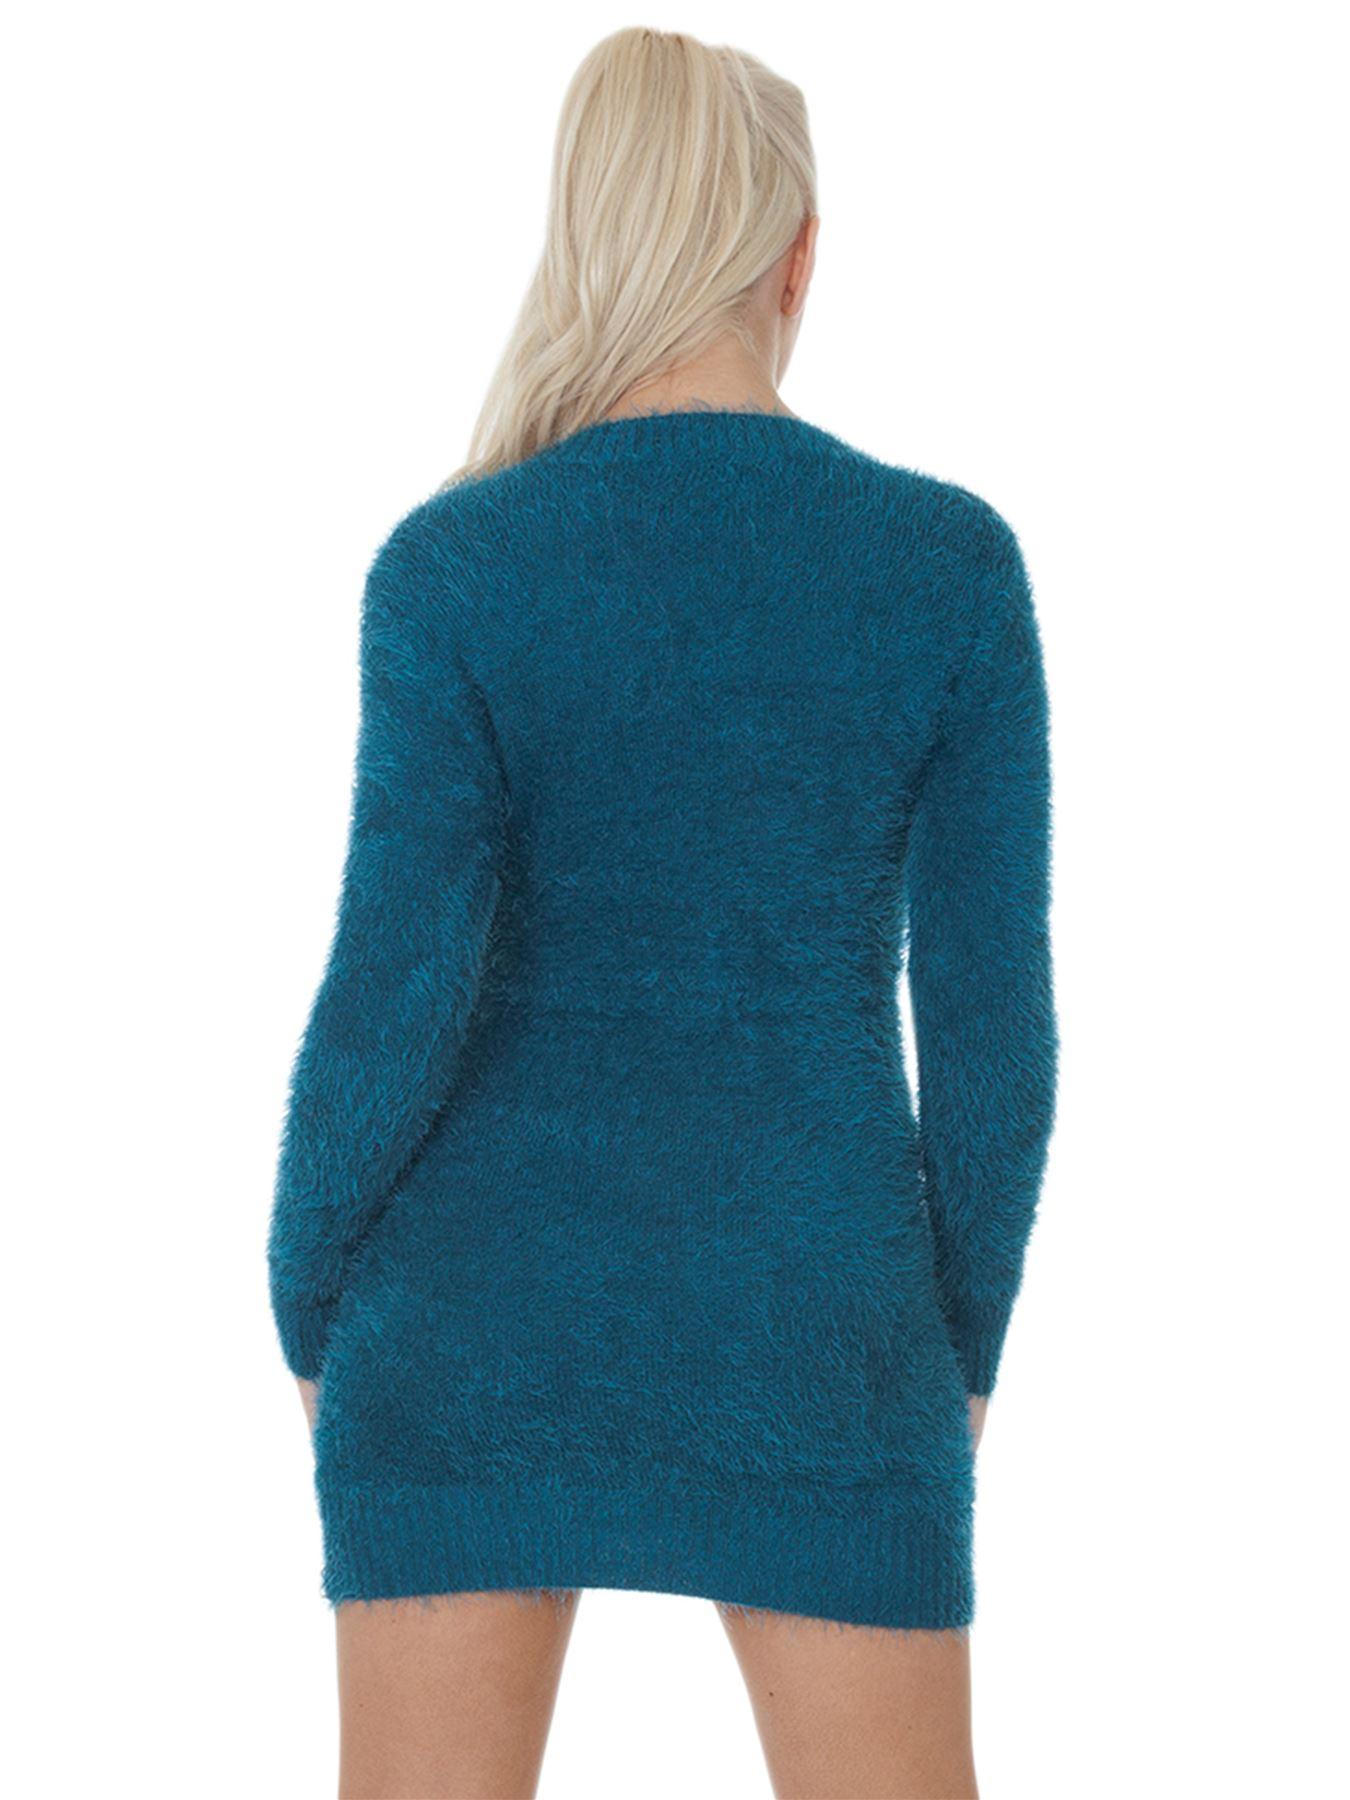 Pull-Femme-Femmes-Tricote-Cardigans-Plain-Tricot-Moelleux-Col-V-Manches-Longues miniature 34